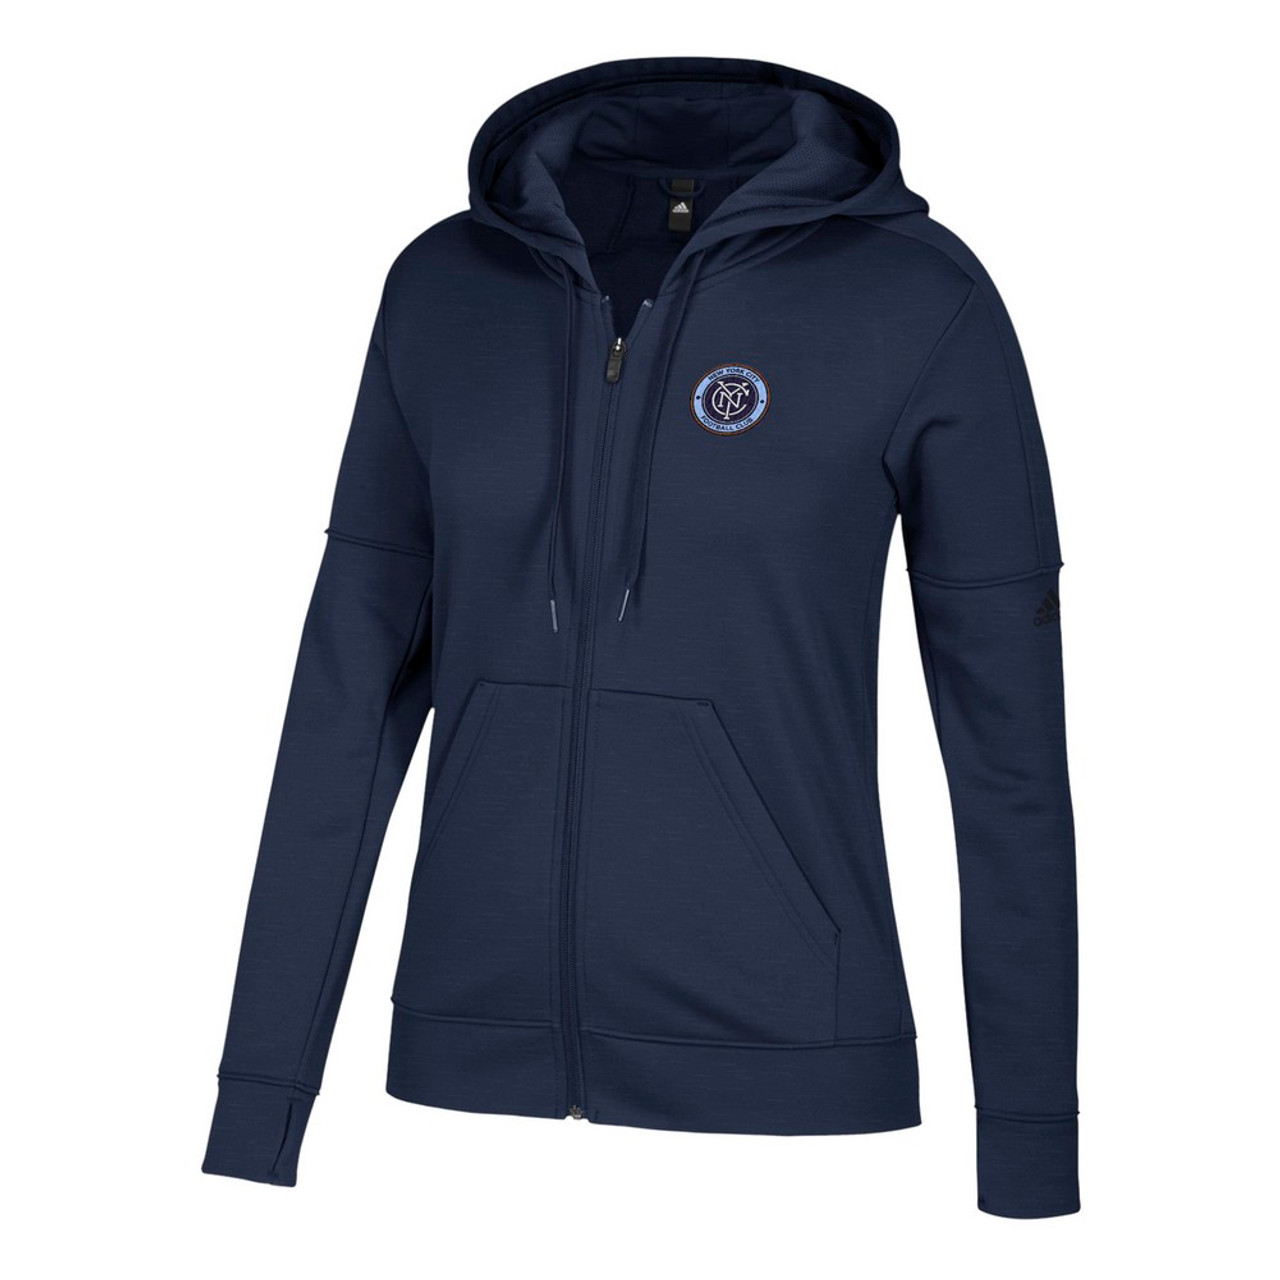 New York City FC Hoodie Women's Team Issue Zip Up Jacket